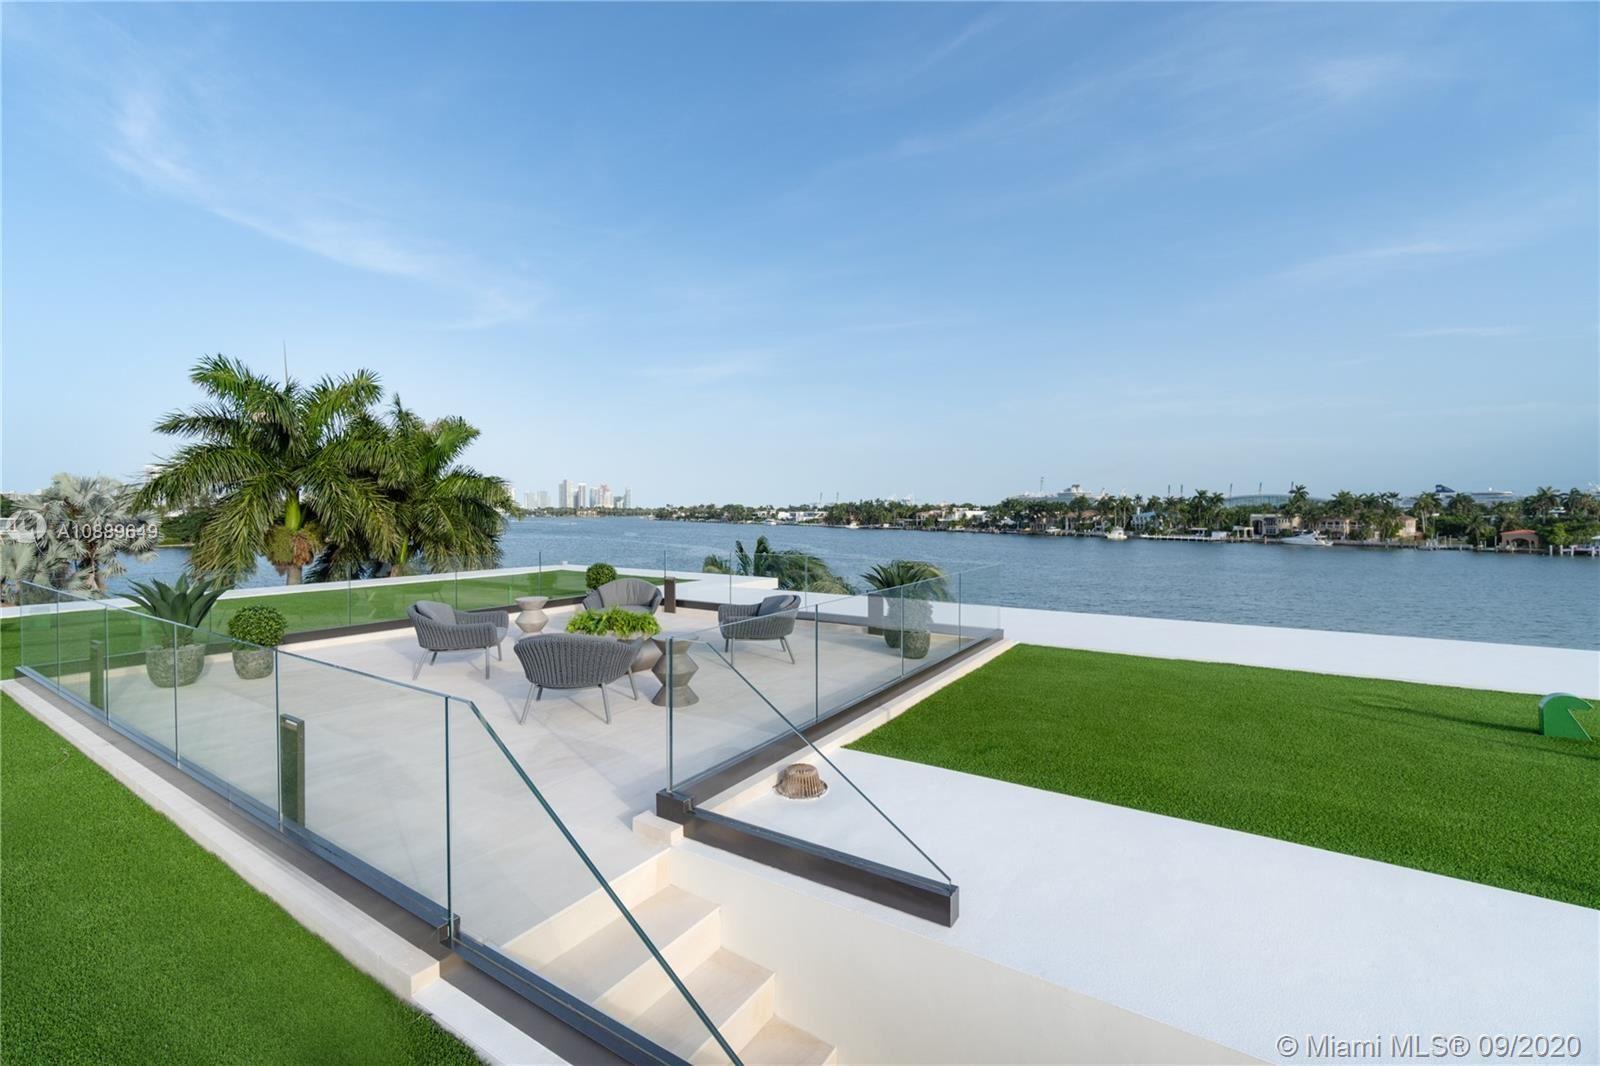 Photo 66 of Listing MLS a10889649 in 10 W San Marino Dr Miami Beach FL 33139